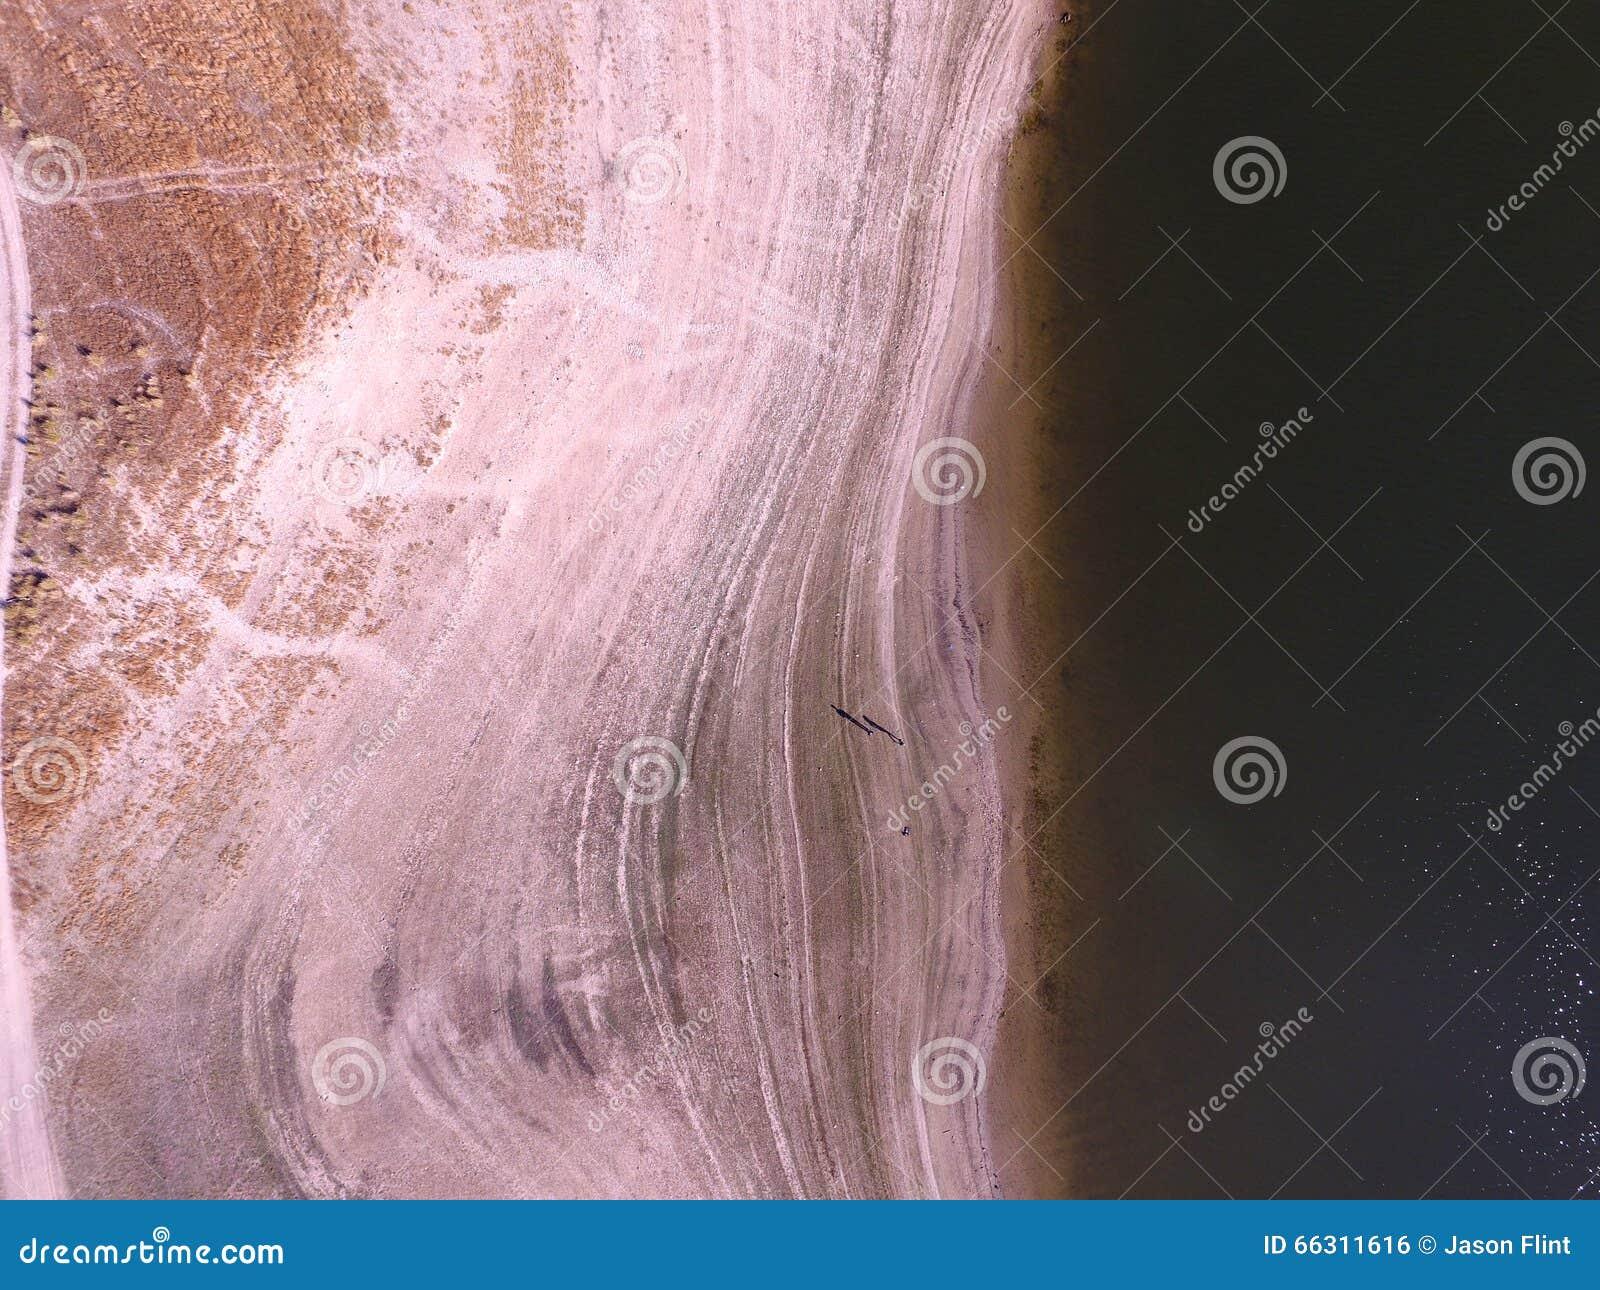 Embalse de Pedrezuela Aerial Photo 1